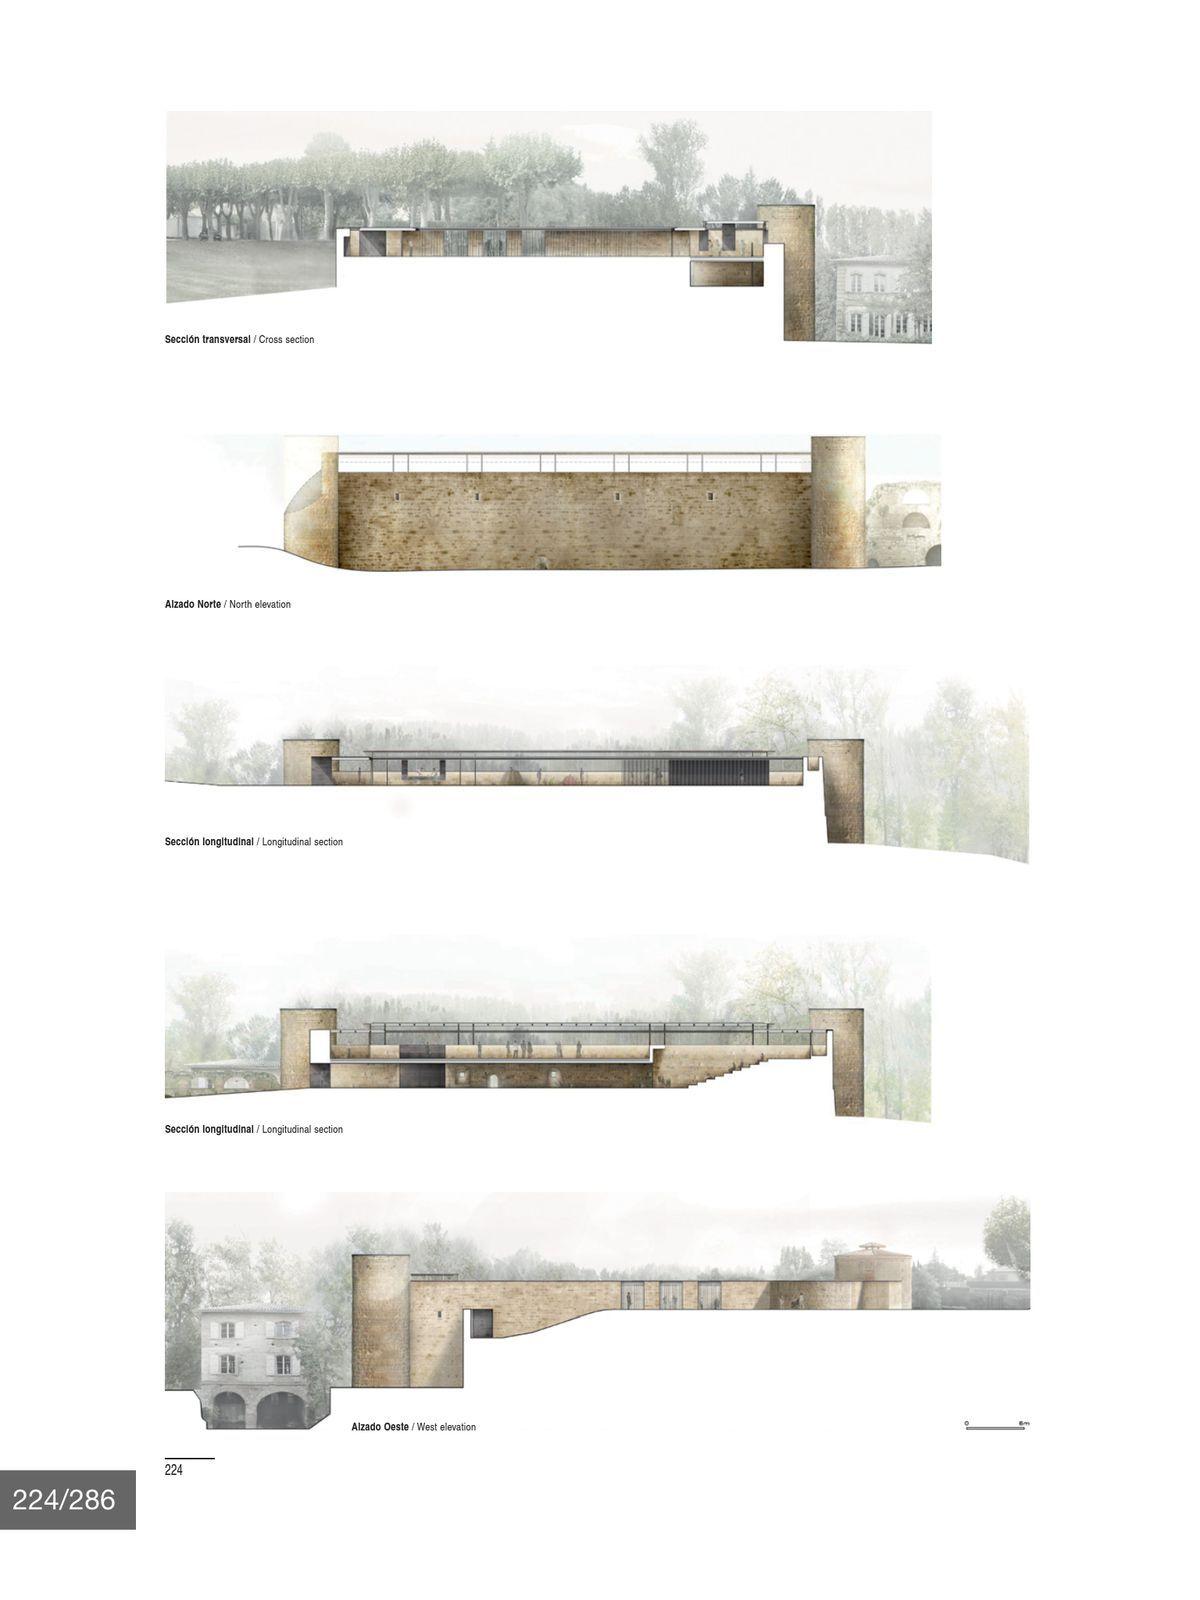 Elevation Plan Scale : Rcr architecture google search arhitecture graphics